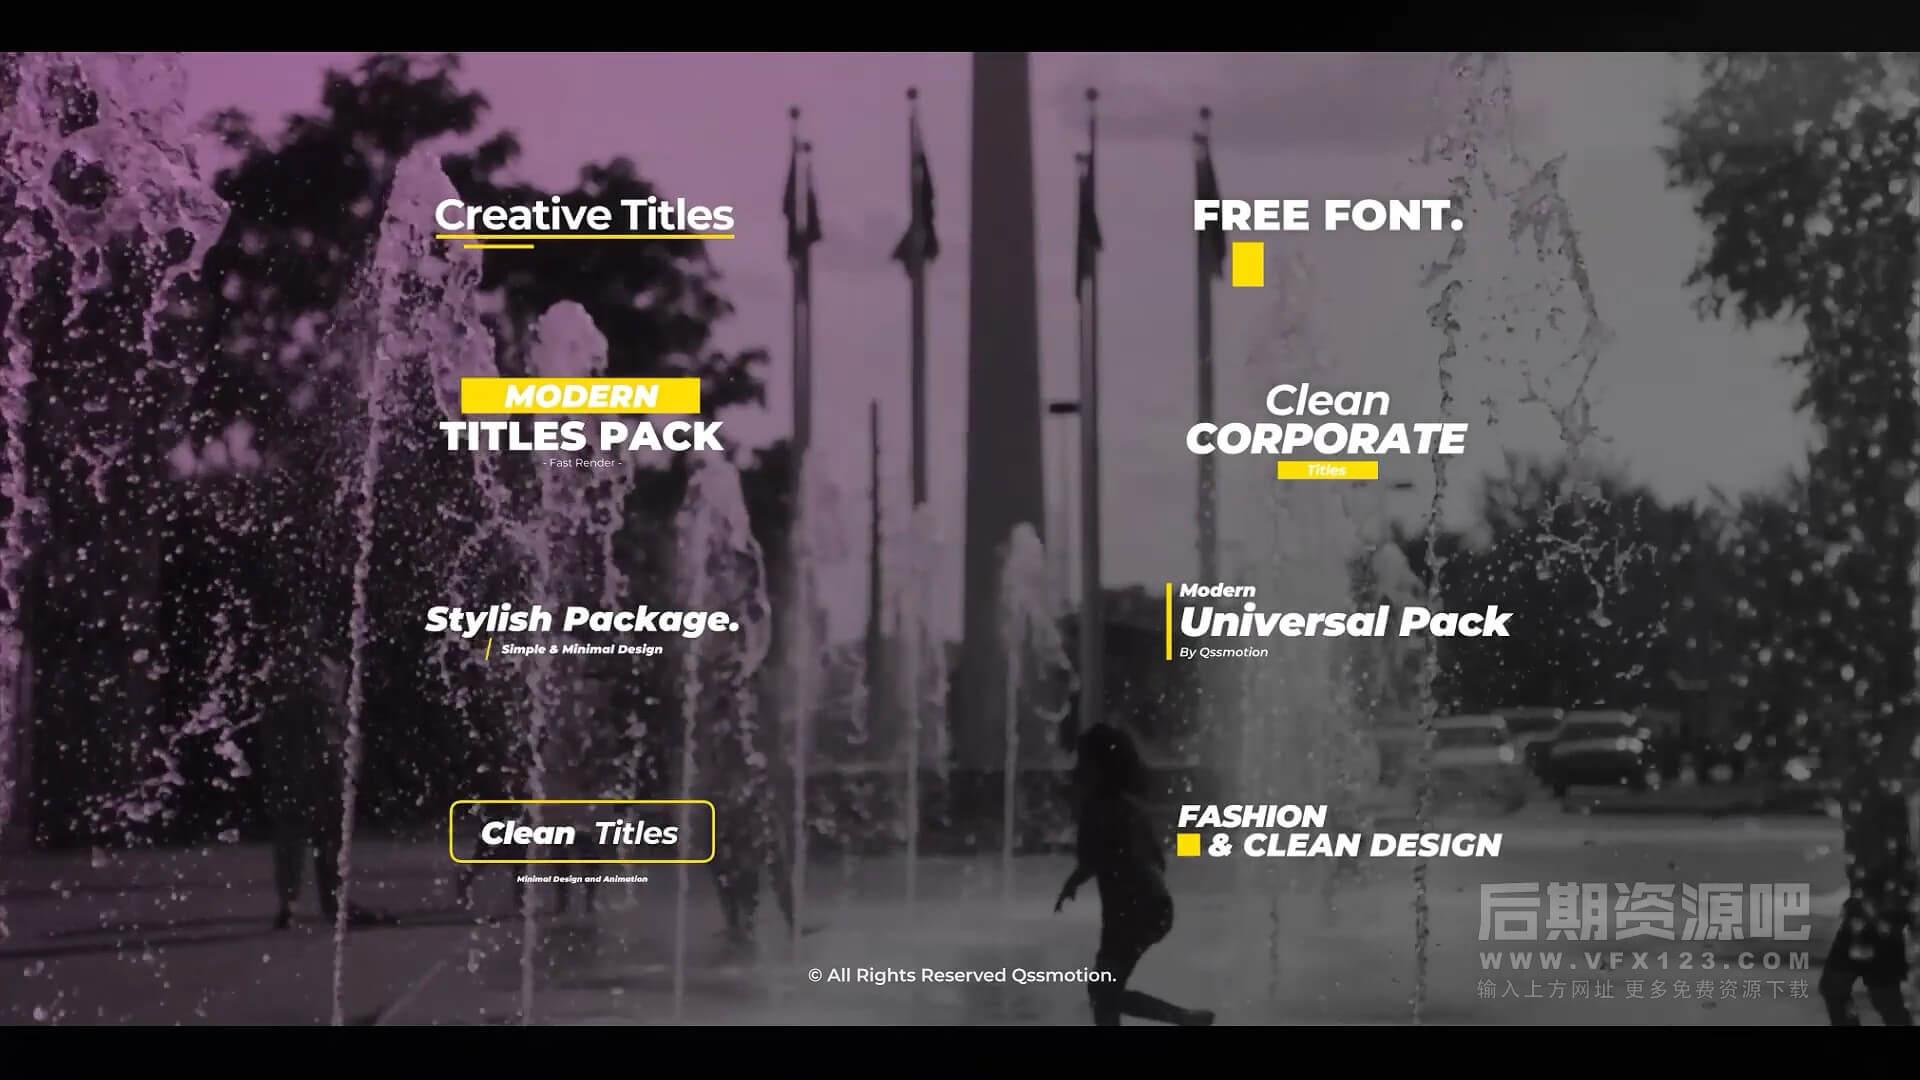 fcpx插件 8个4K迷你创意标题模板 Minimal and Creative Titles